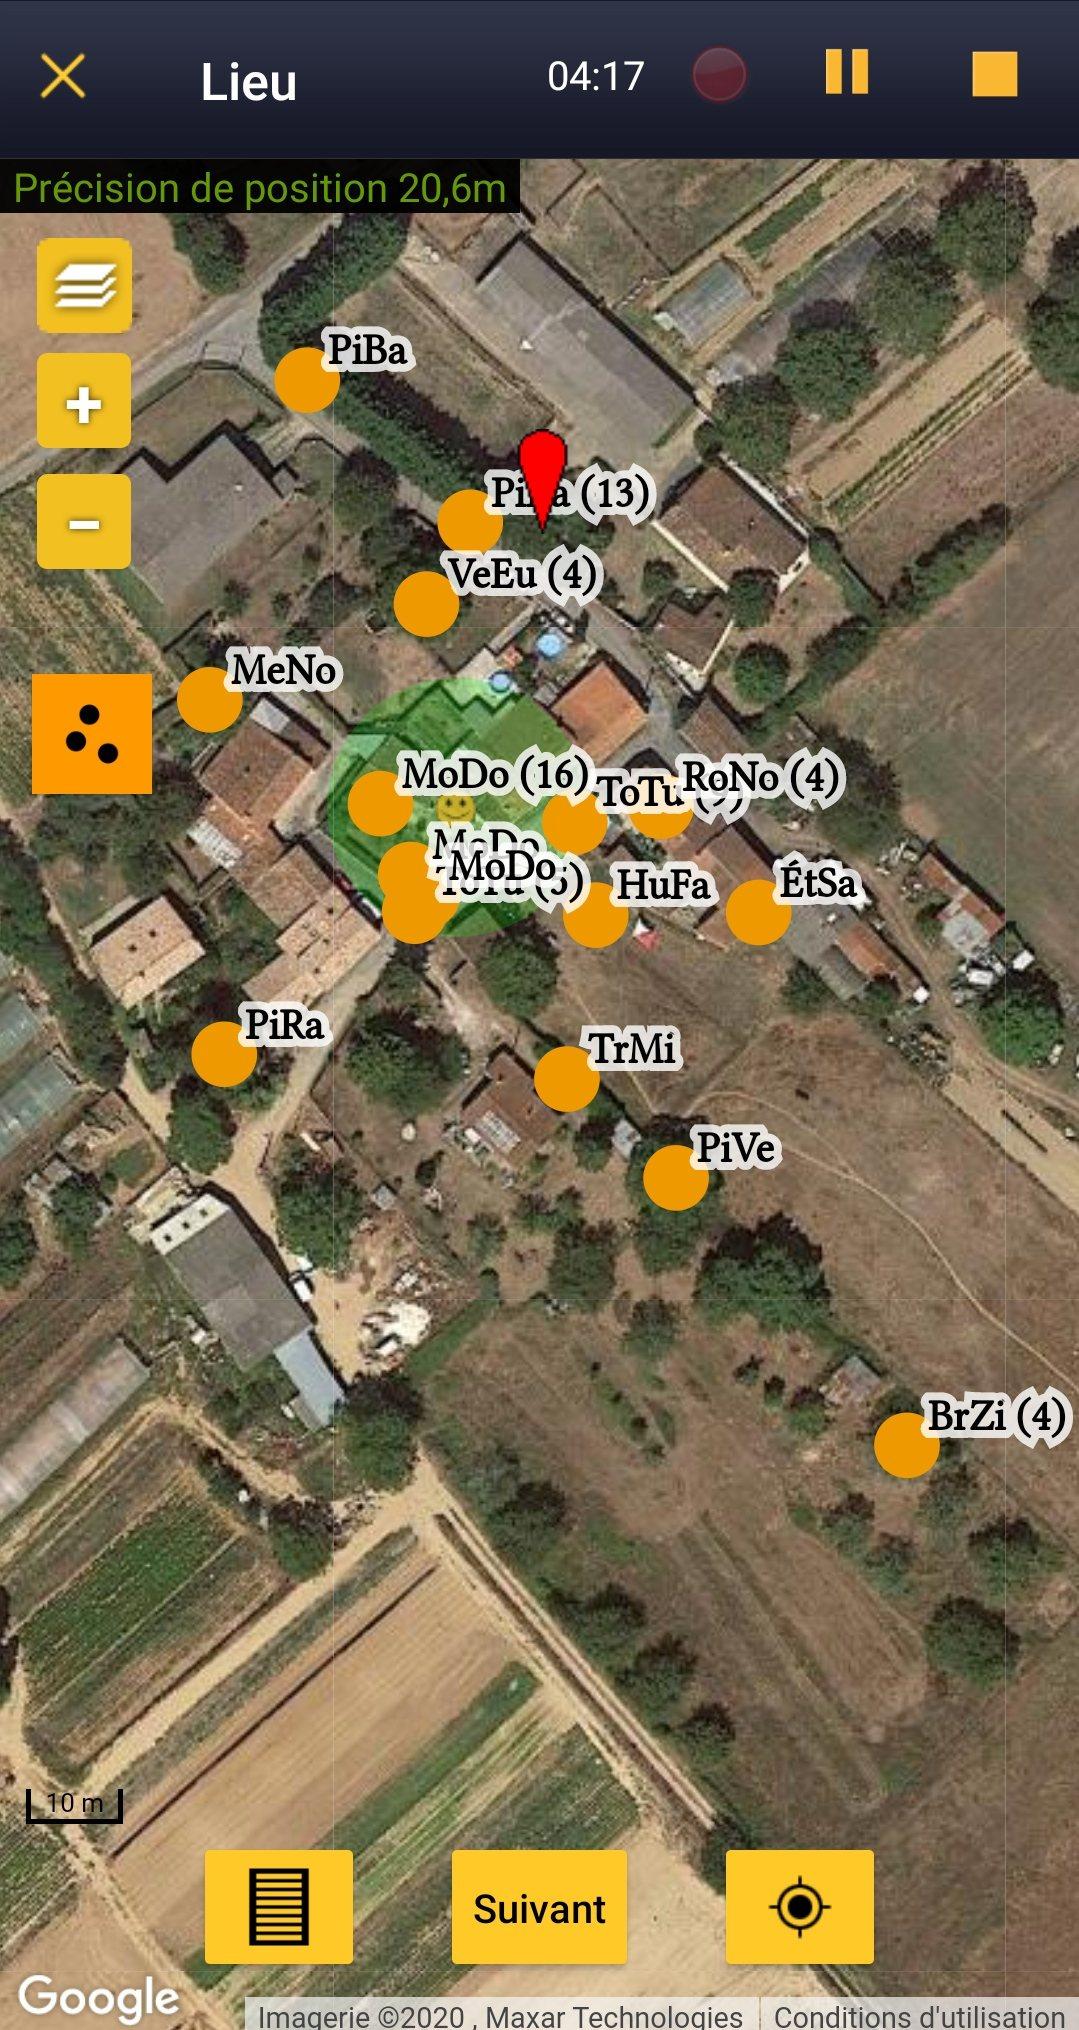 https://cdnfiles1.biolovision.net/www.faune-france.org/userfiles/FauneFrance/FFIconoAutre/NaturaListlite.jpg